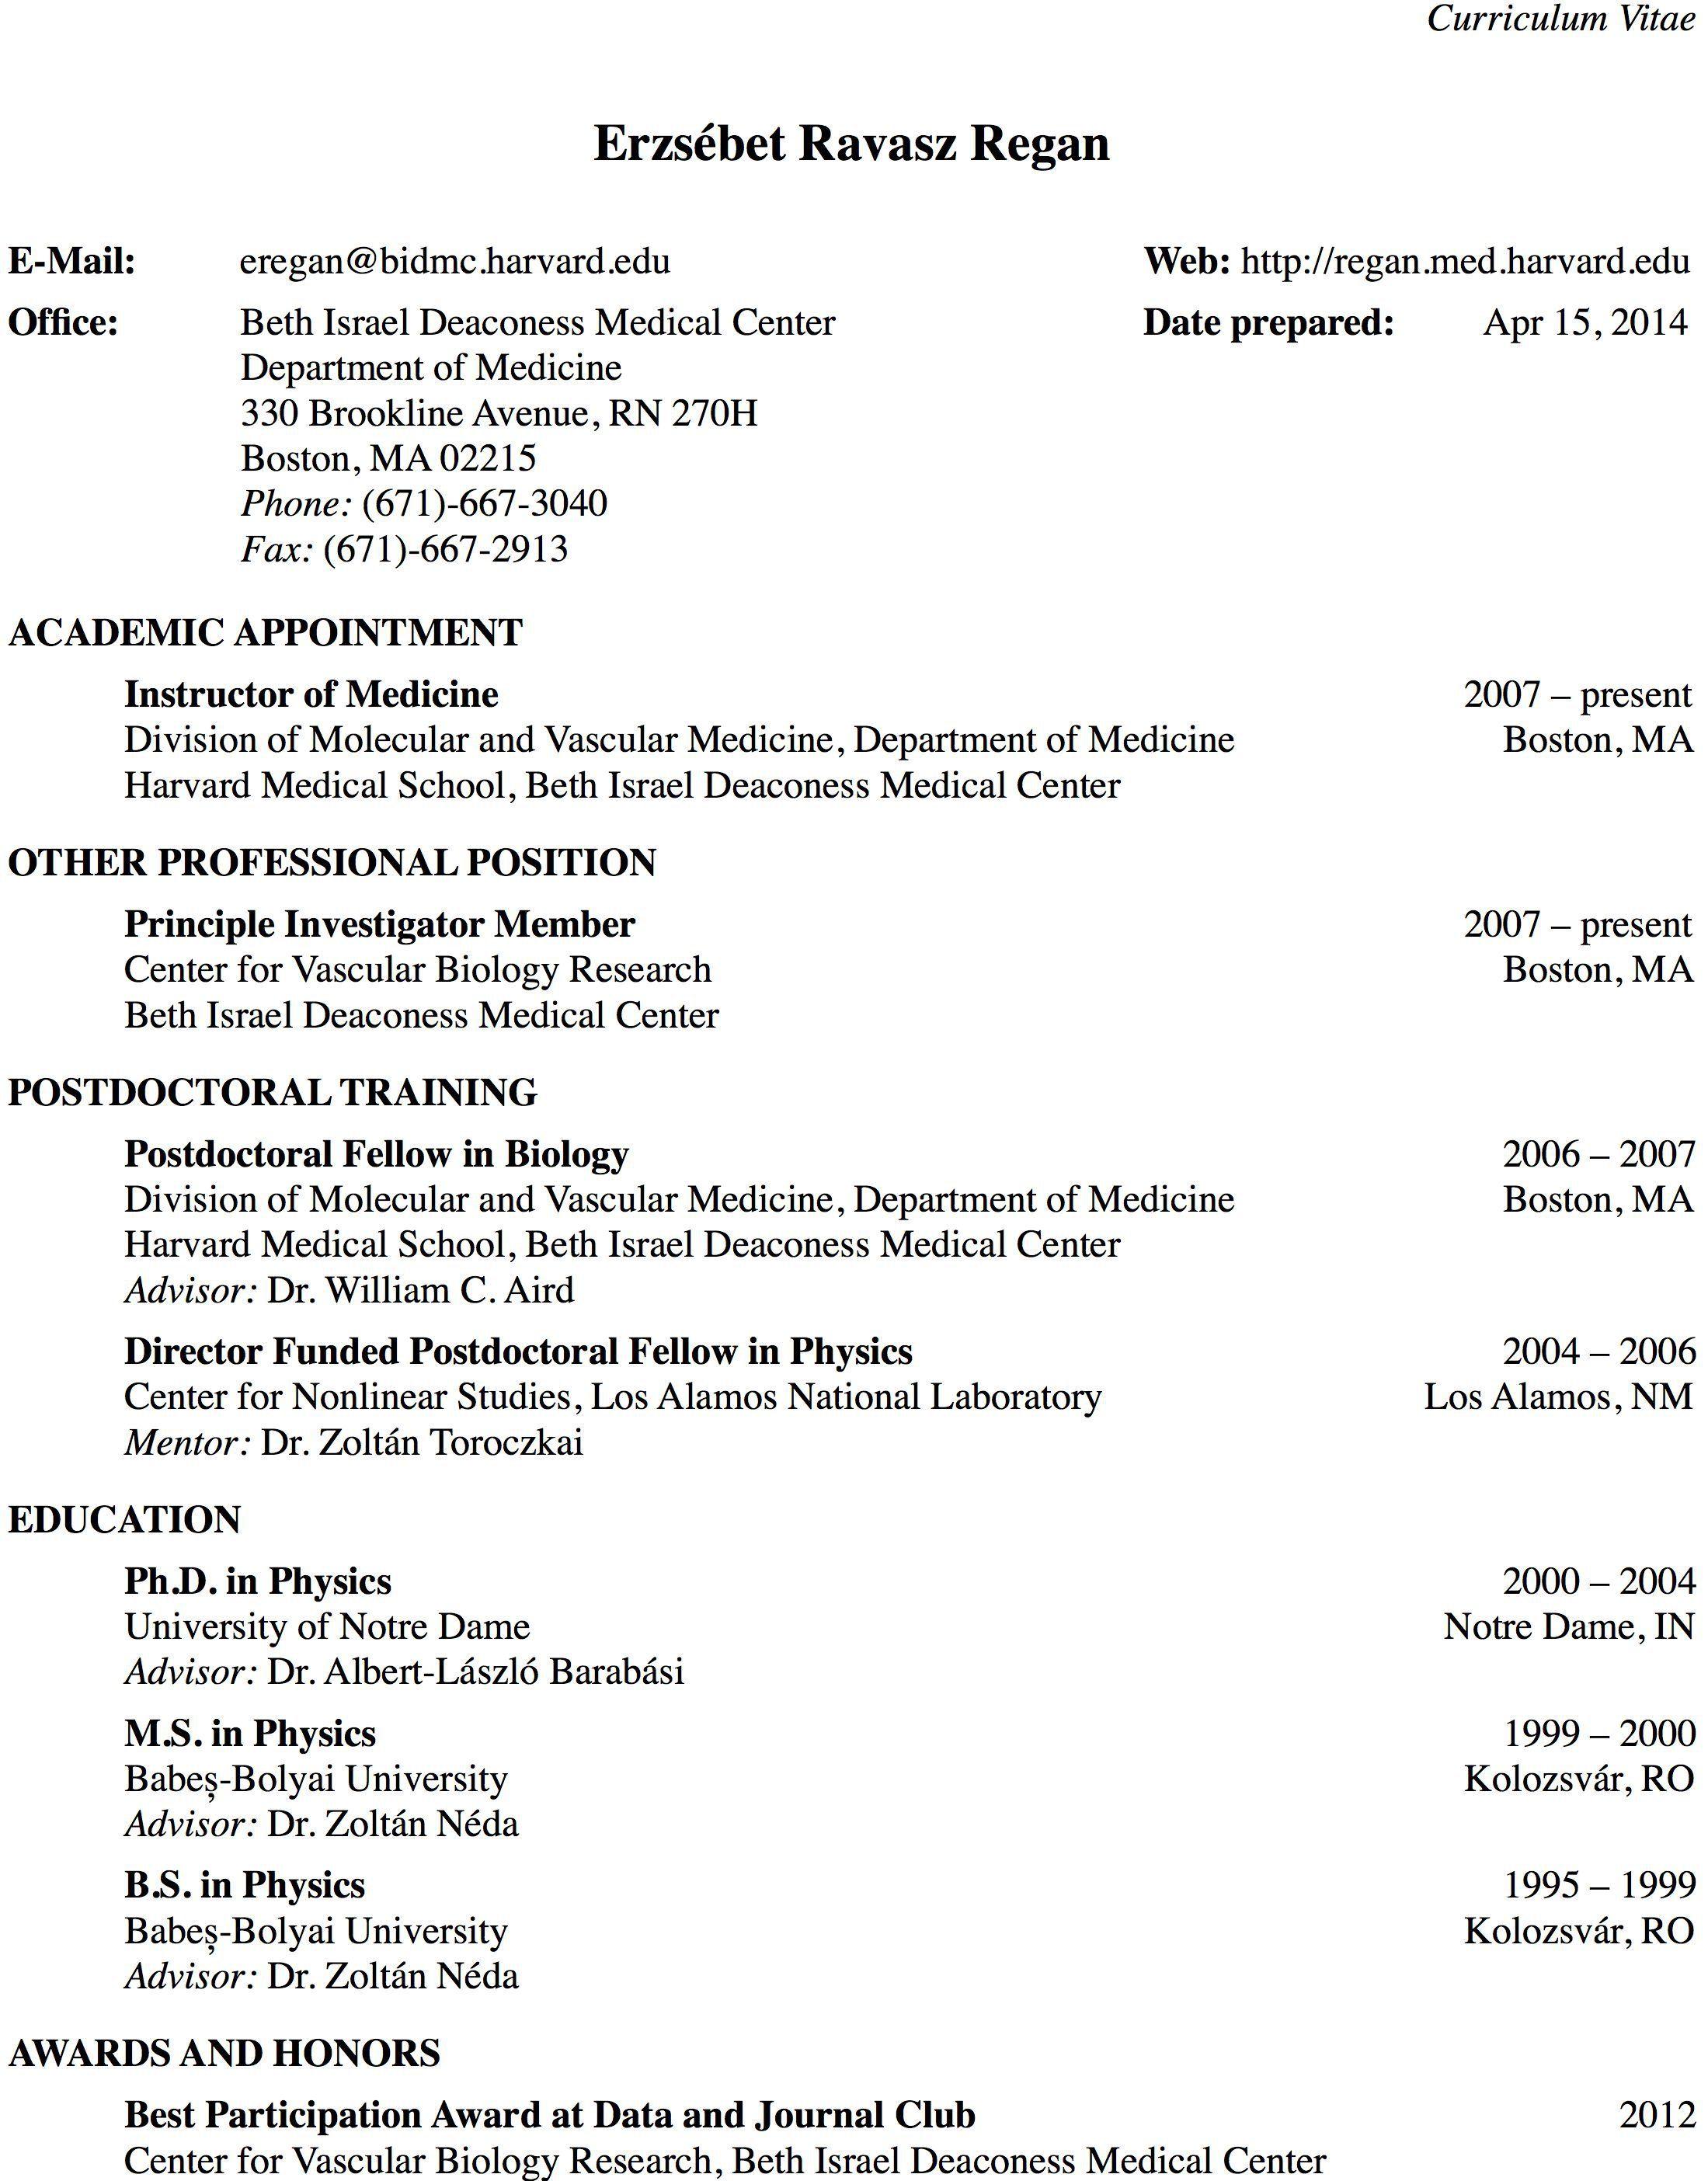 Cv template harvard harvard medical school academic cv